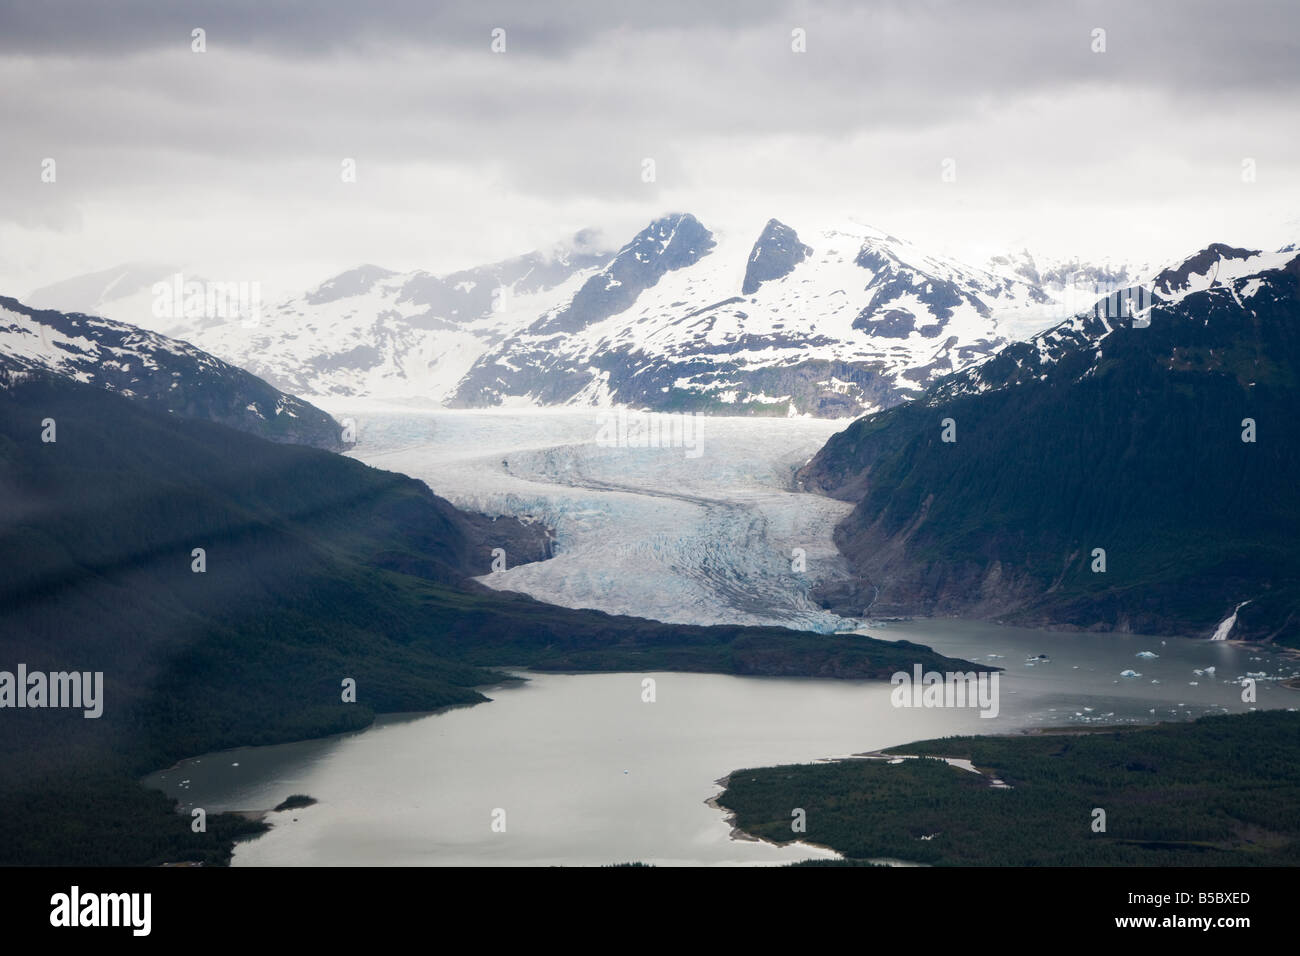 Mendenhall Glacier flows into Mendenhall Lake near Juneau, Alaska, USA - Stock Image